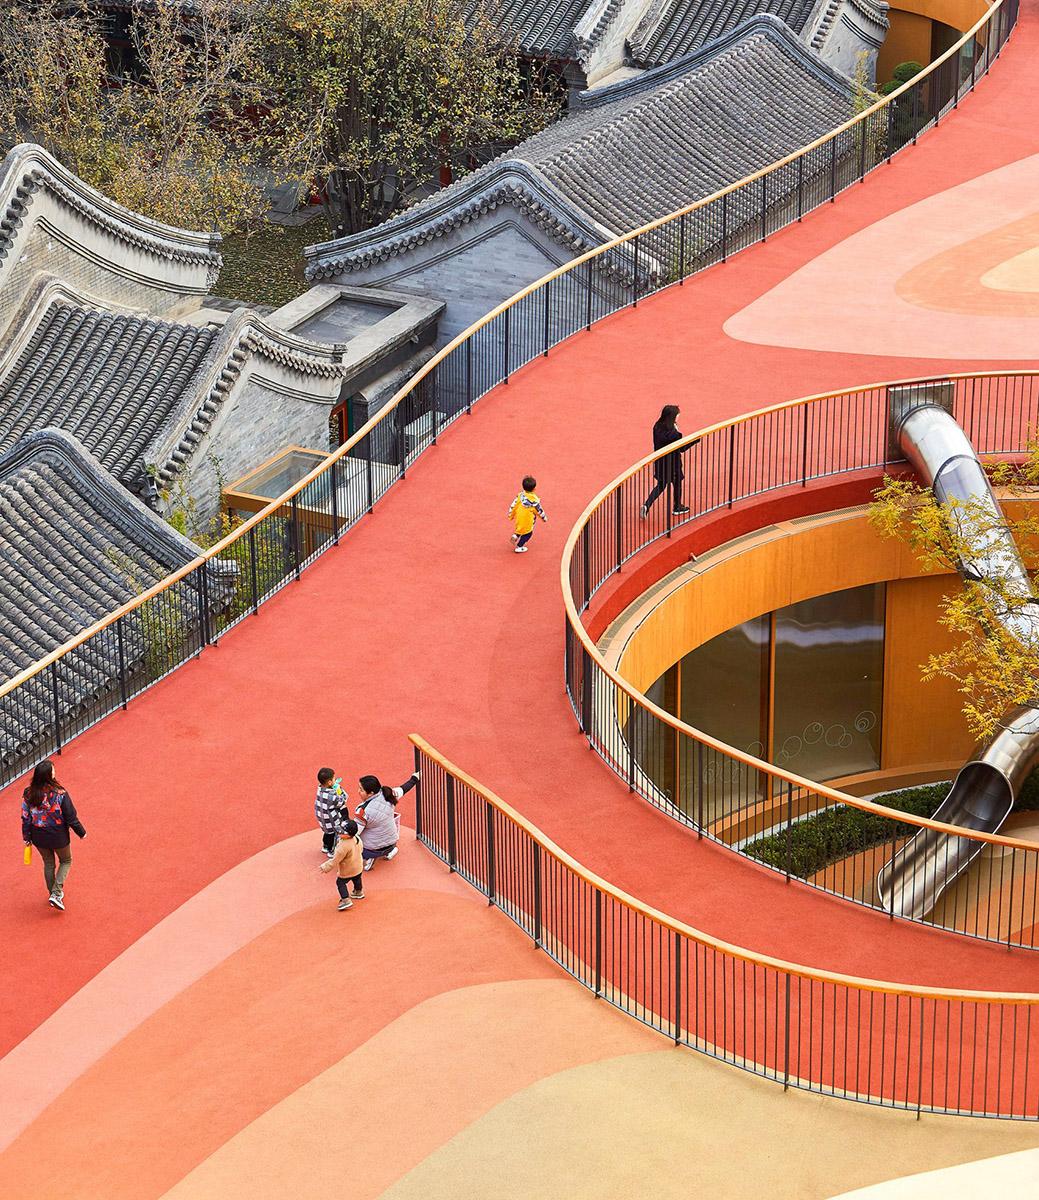 YueCheng-Courtyard-Kindergarten-MAD-Hufton-Crow-02